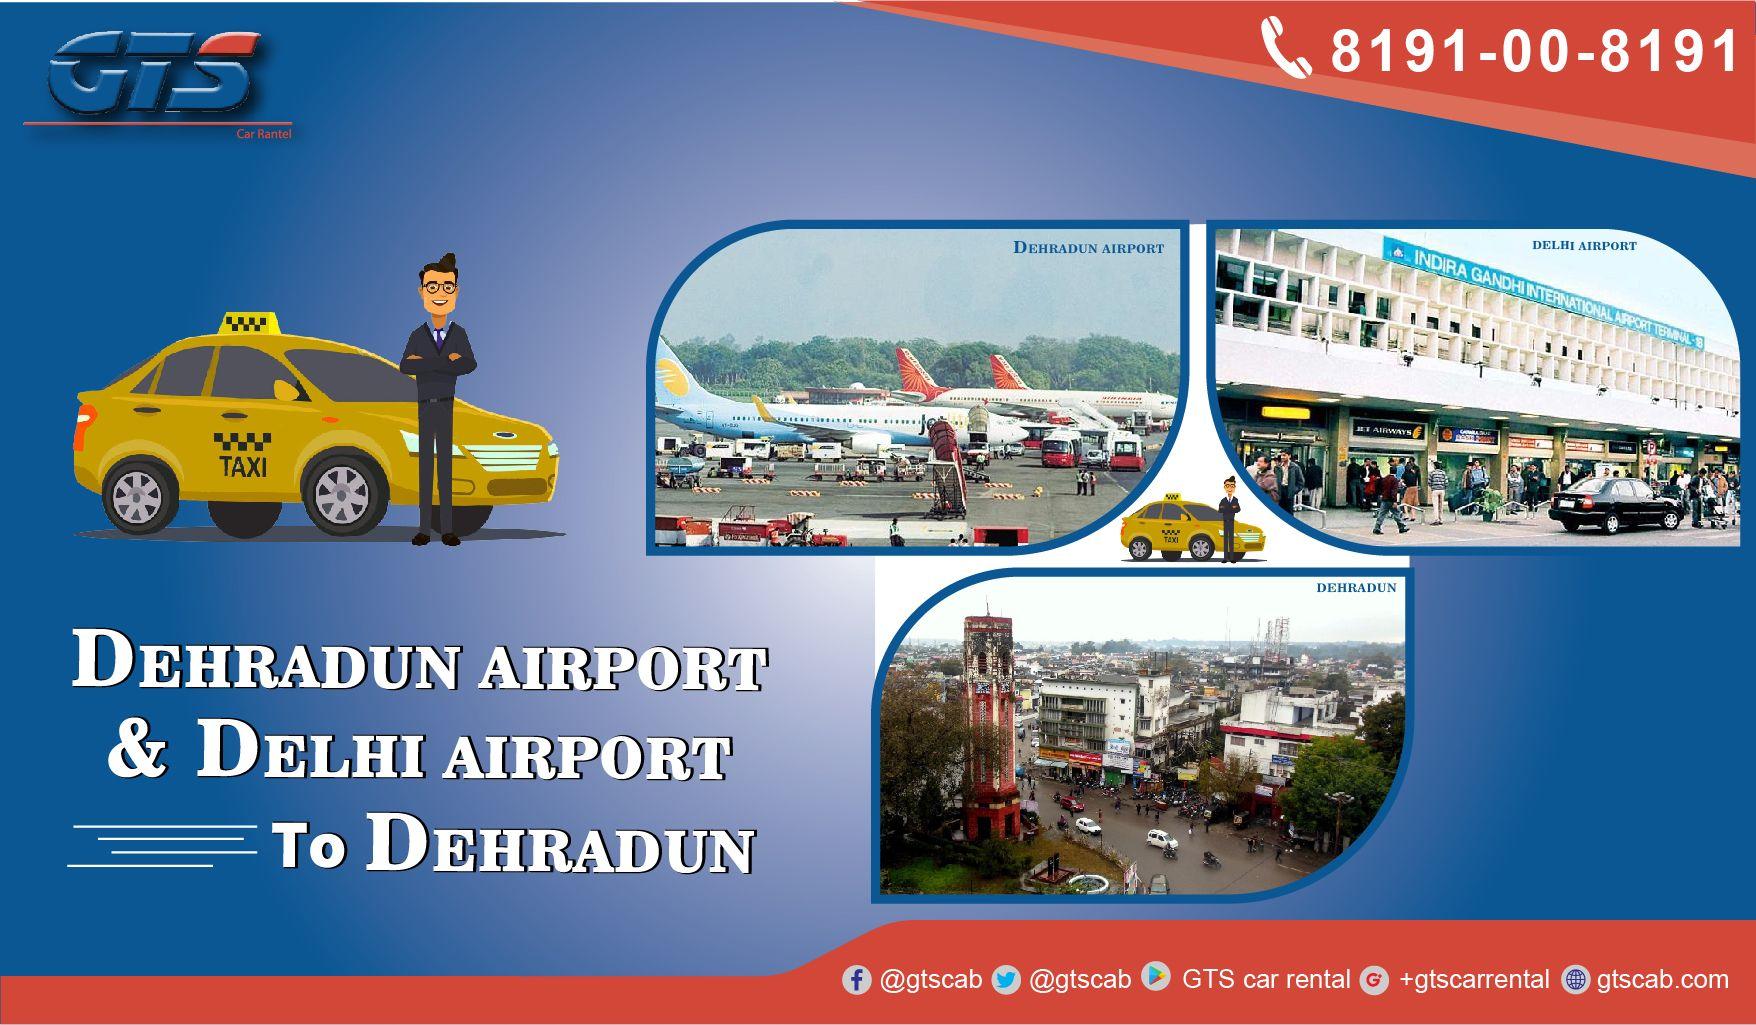 delhiairport & Dehradunairport pickup and drop cab